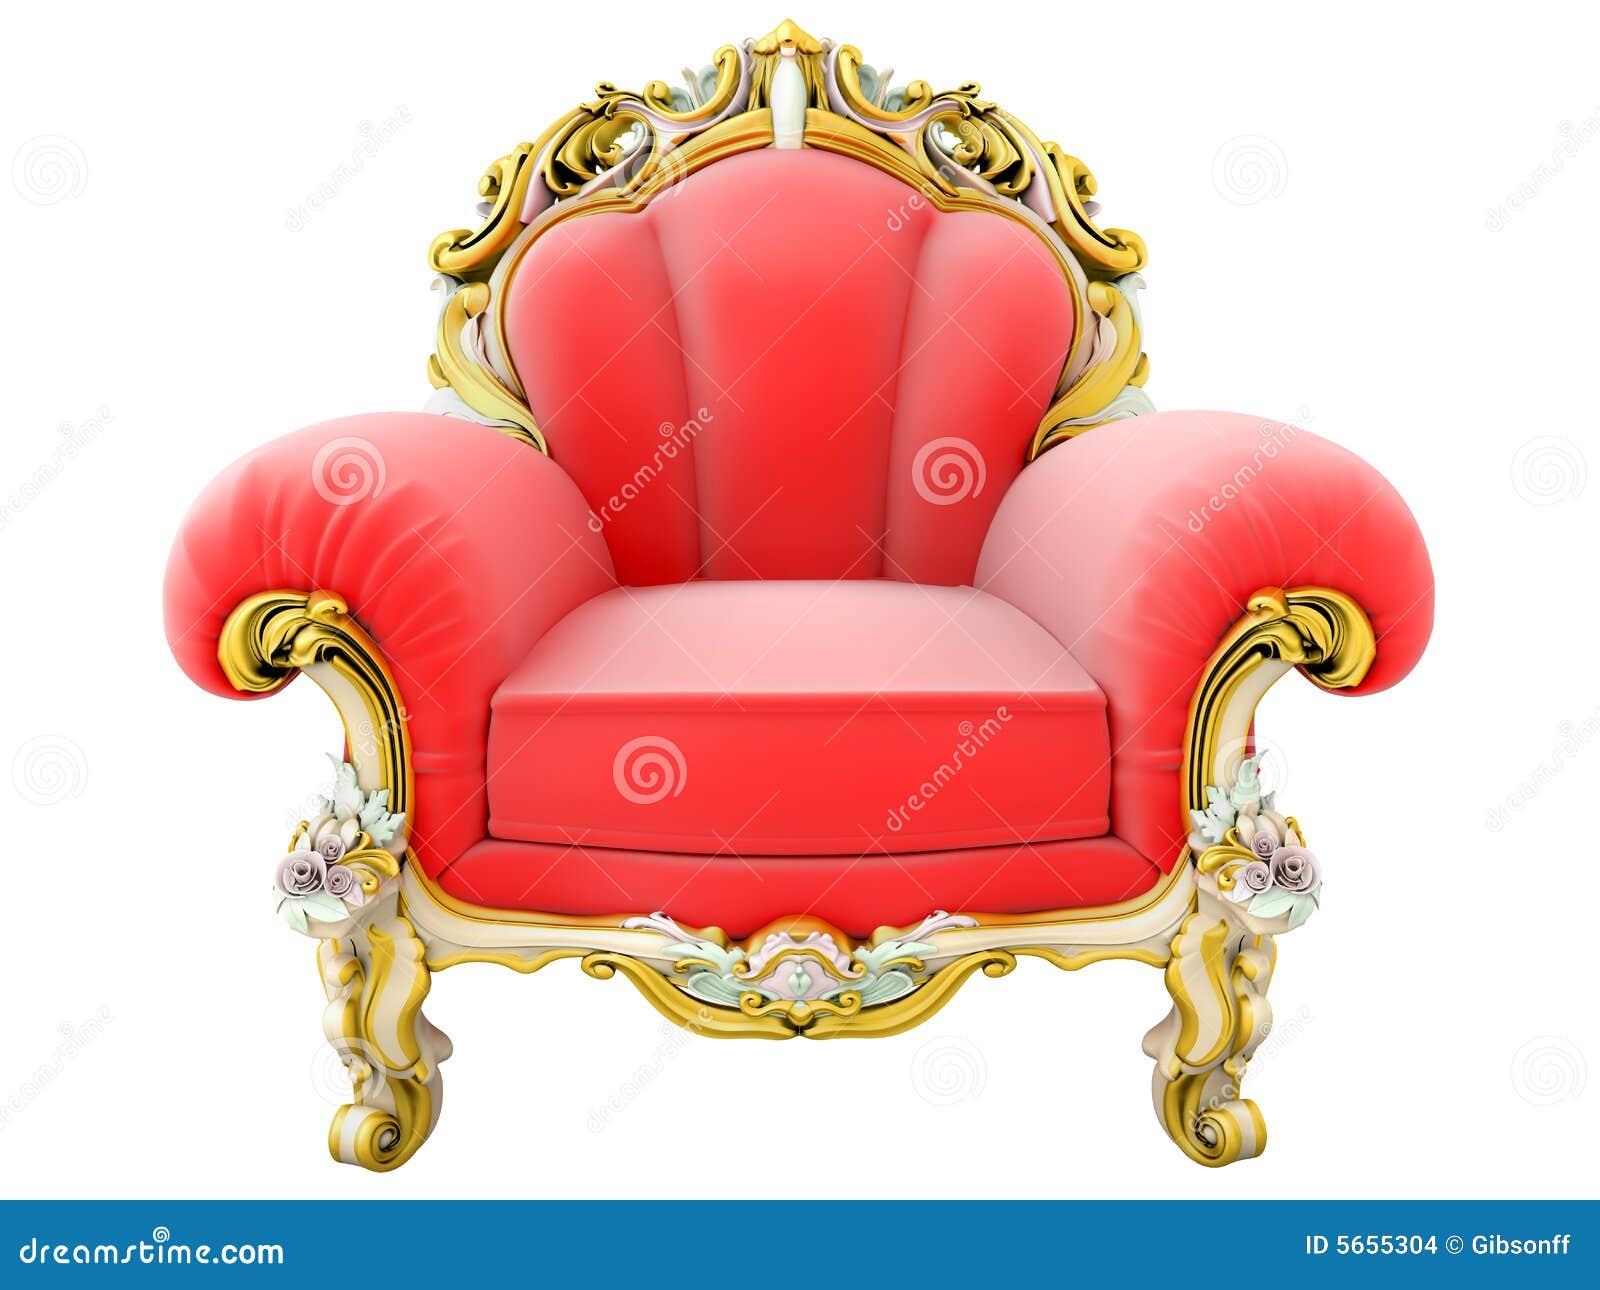 King armchair